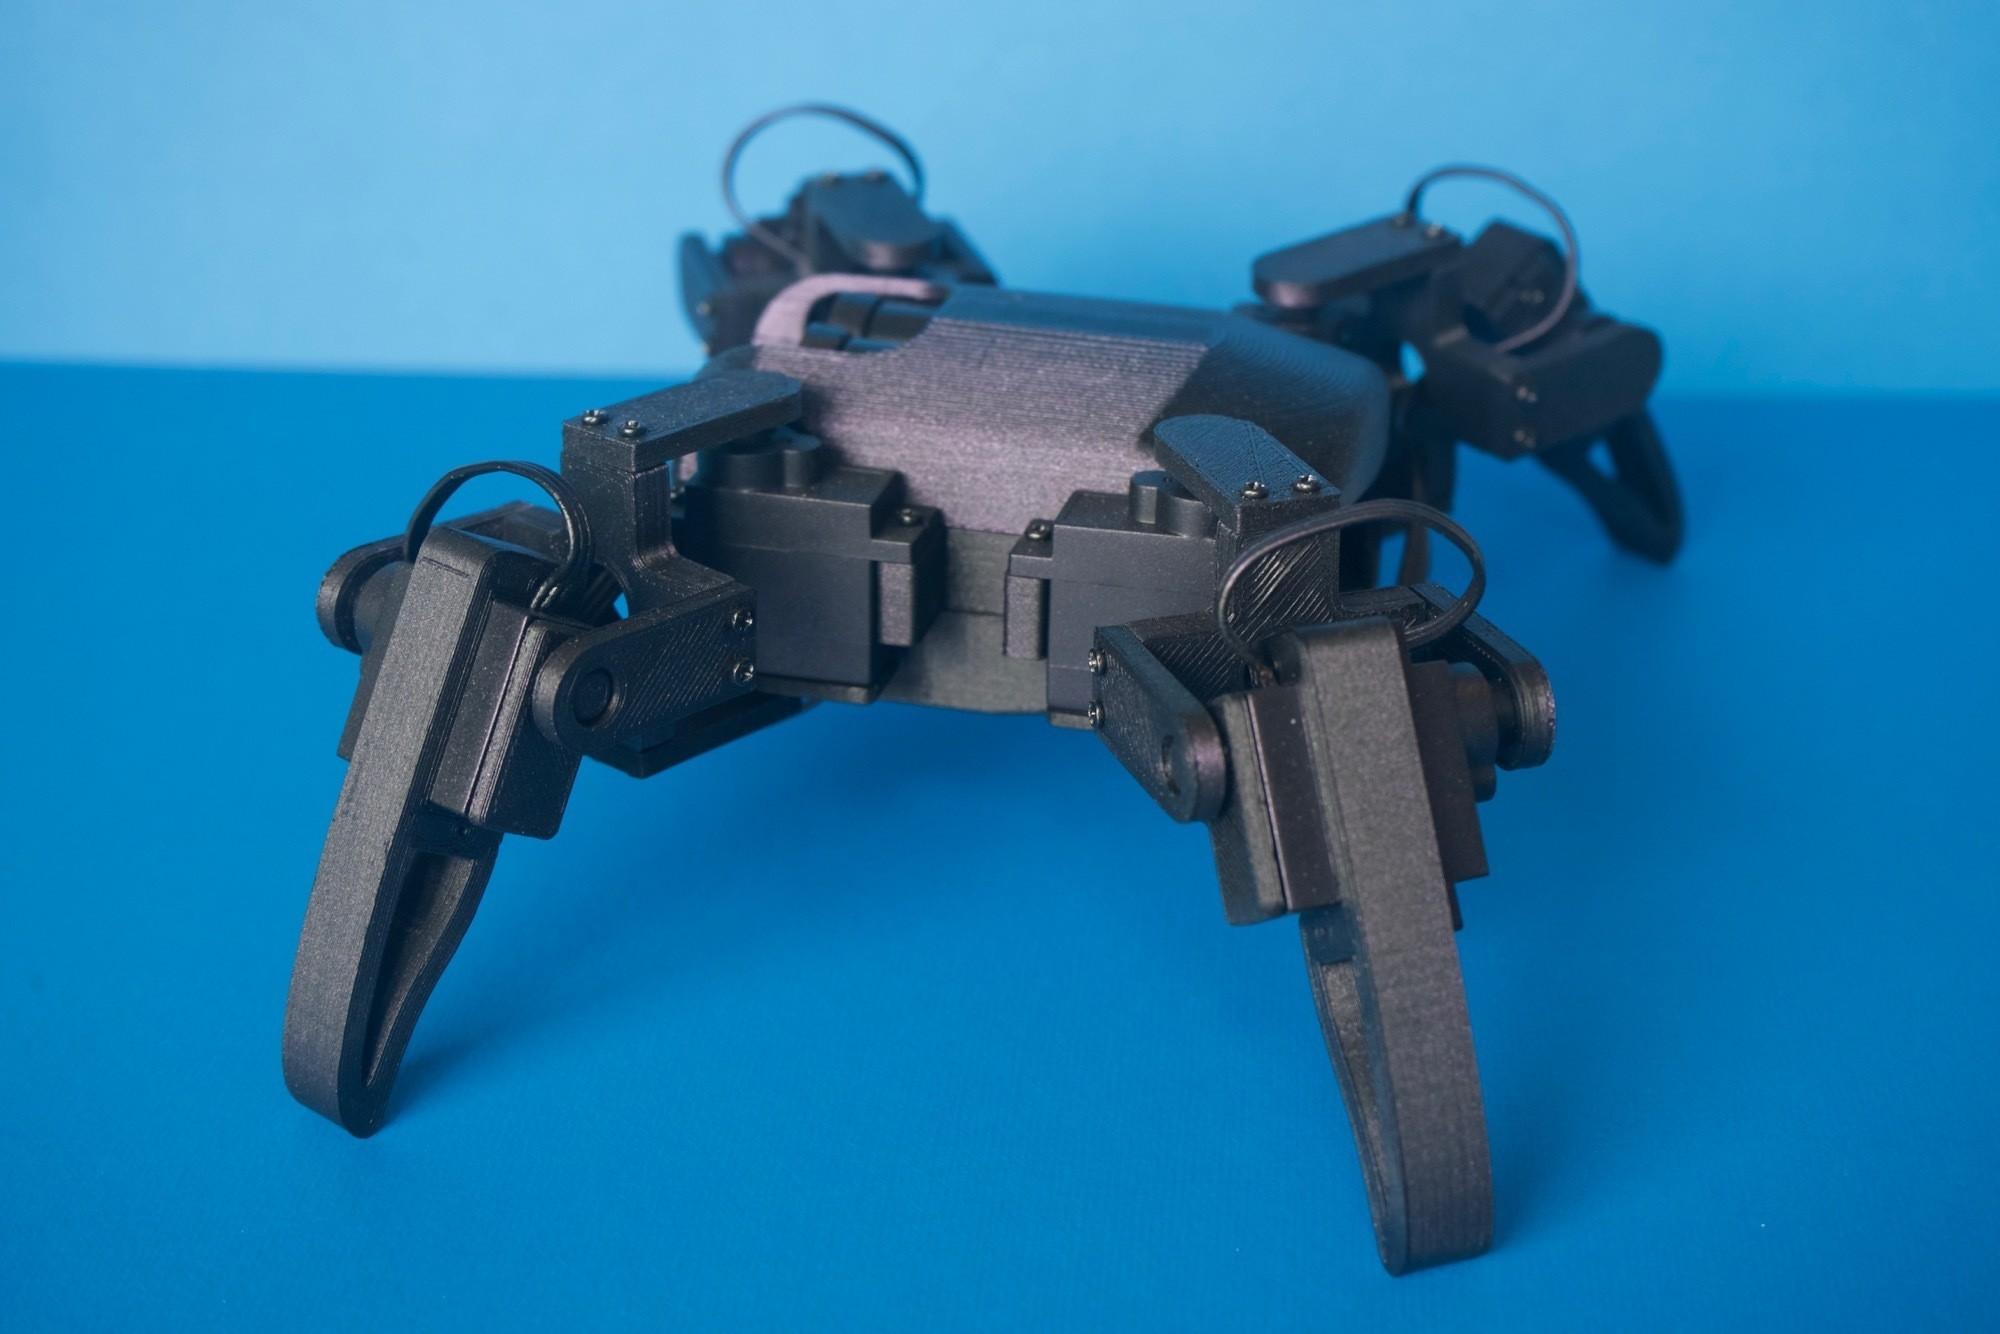 Q1mini007.jpg Download free STL file Q1 mini Quadruped Robot 2.0 (Designed by Jason Workshop) • 3D printing design, Jason8866